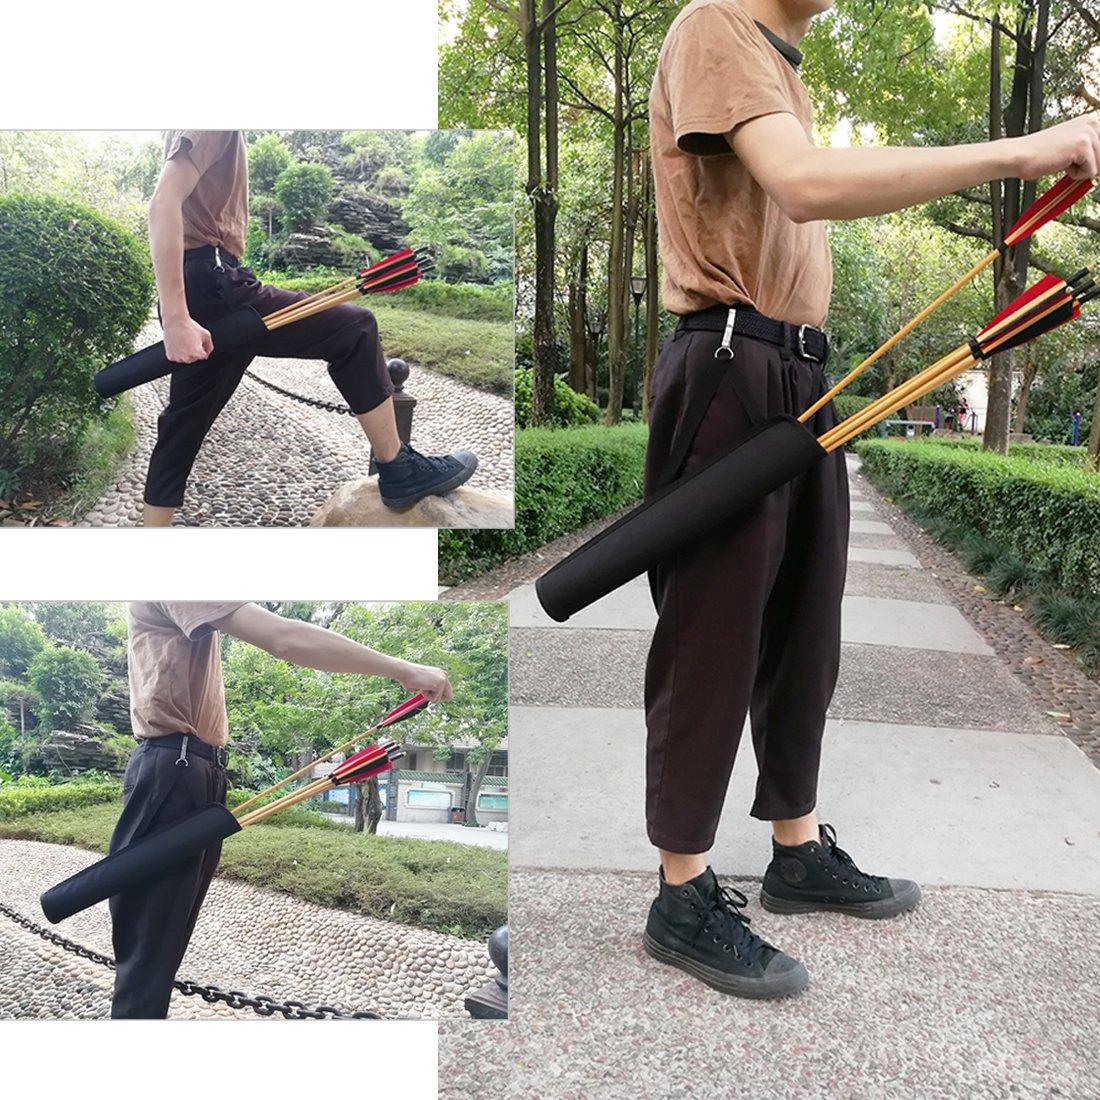 KRATARC Archery Arrows Tube Hip Quiver Waist Hanged Carry Bag